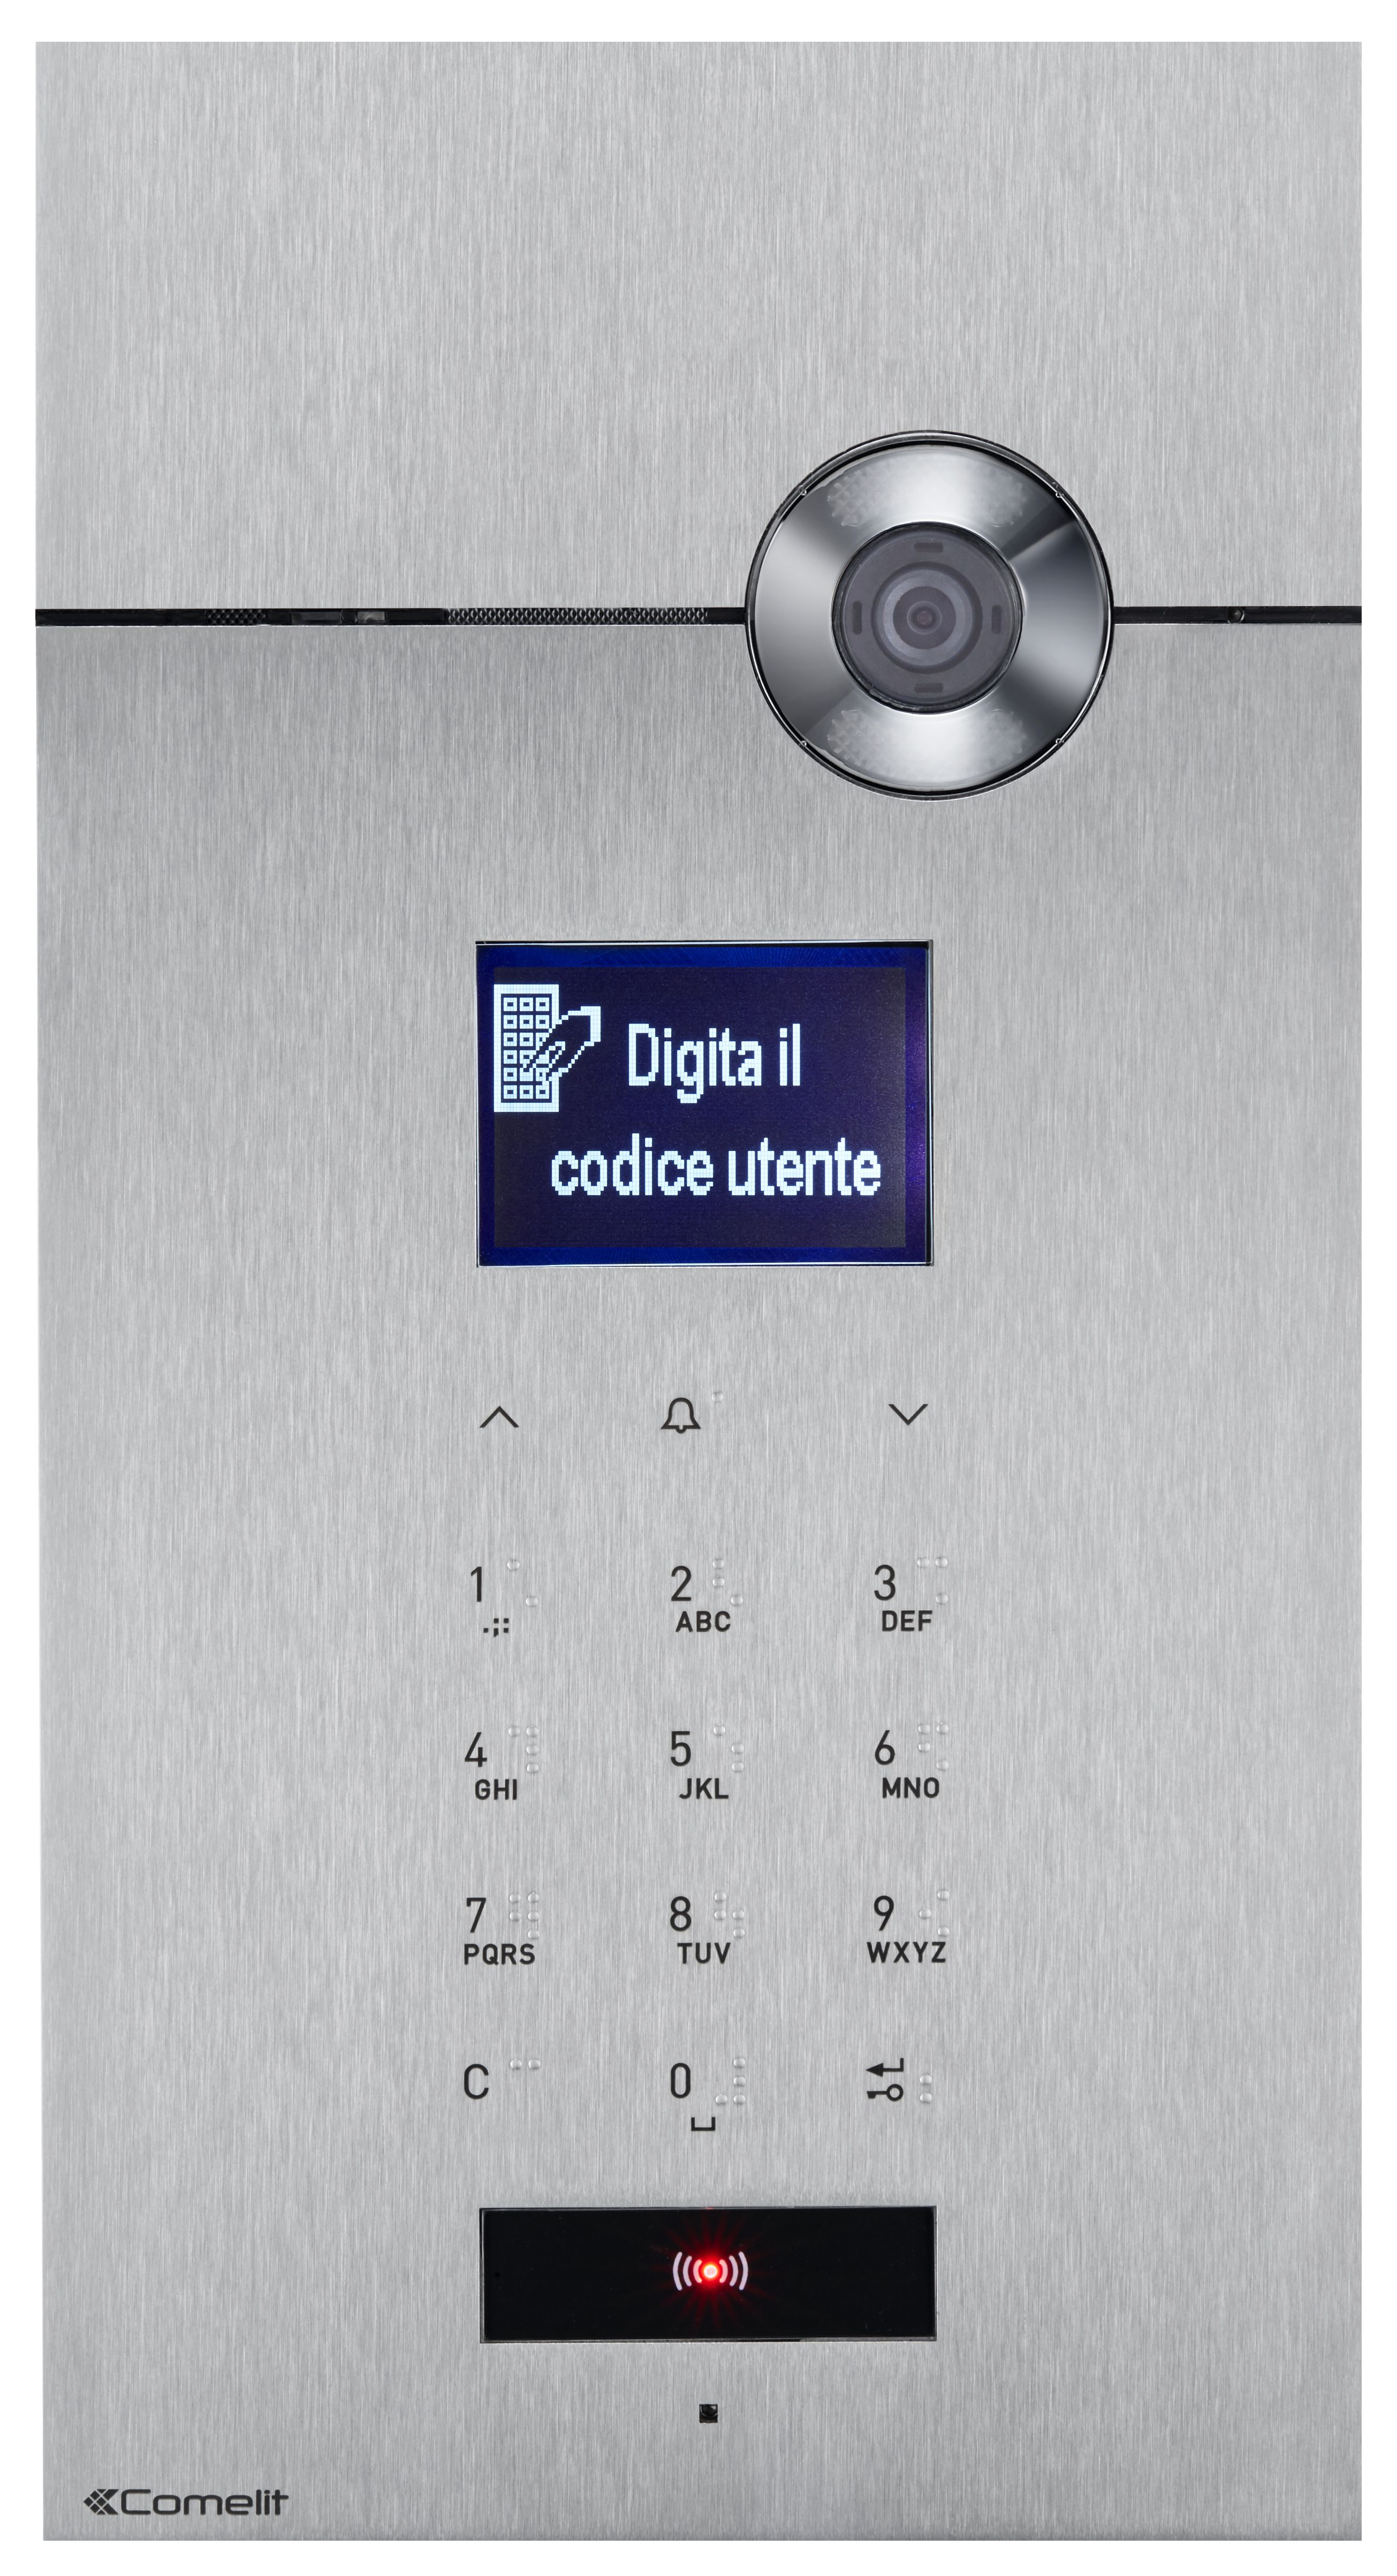 1 Stk 316 SENSE-Panel Video mit Digital-Tastenfeld, Edelstahl, VIP SP3452H---